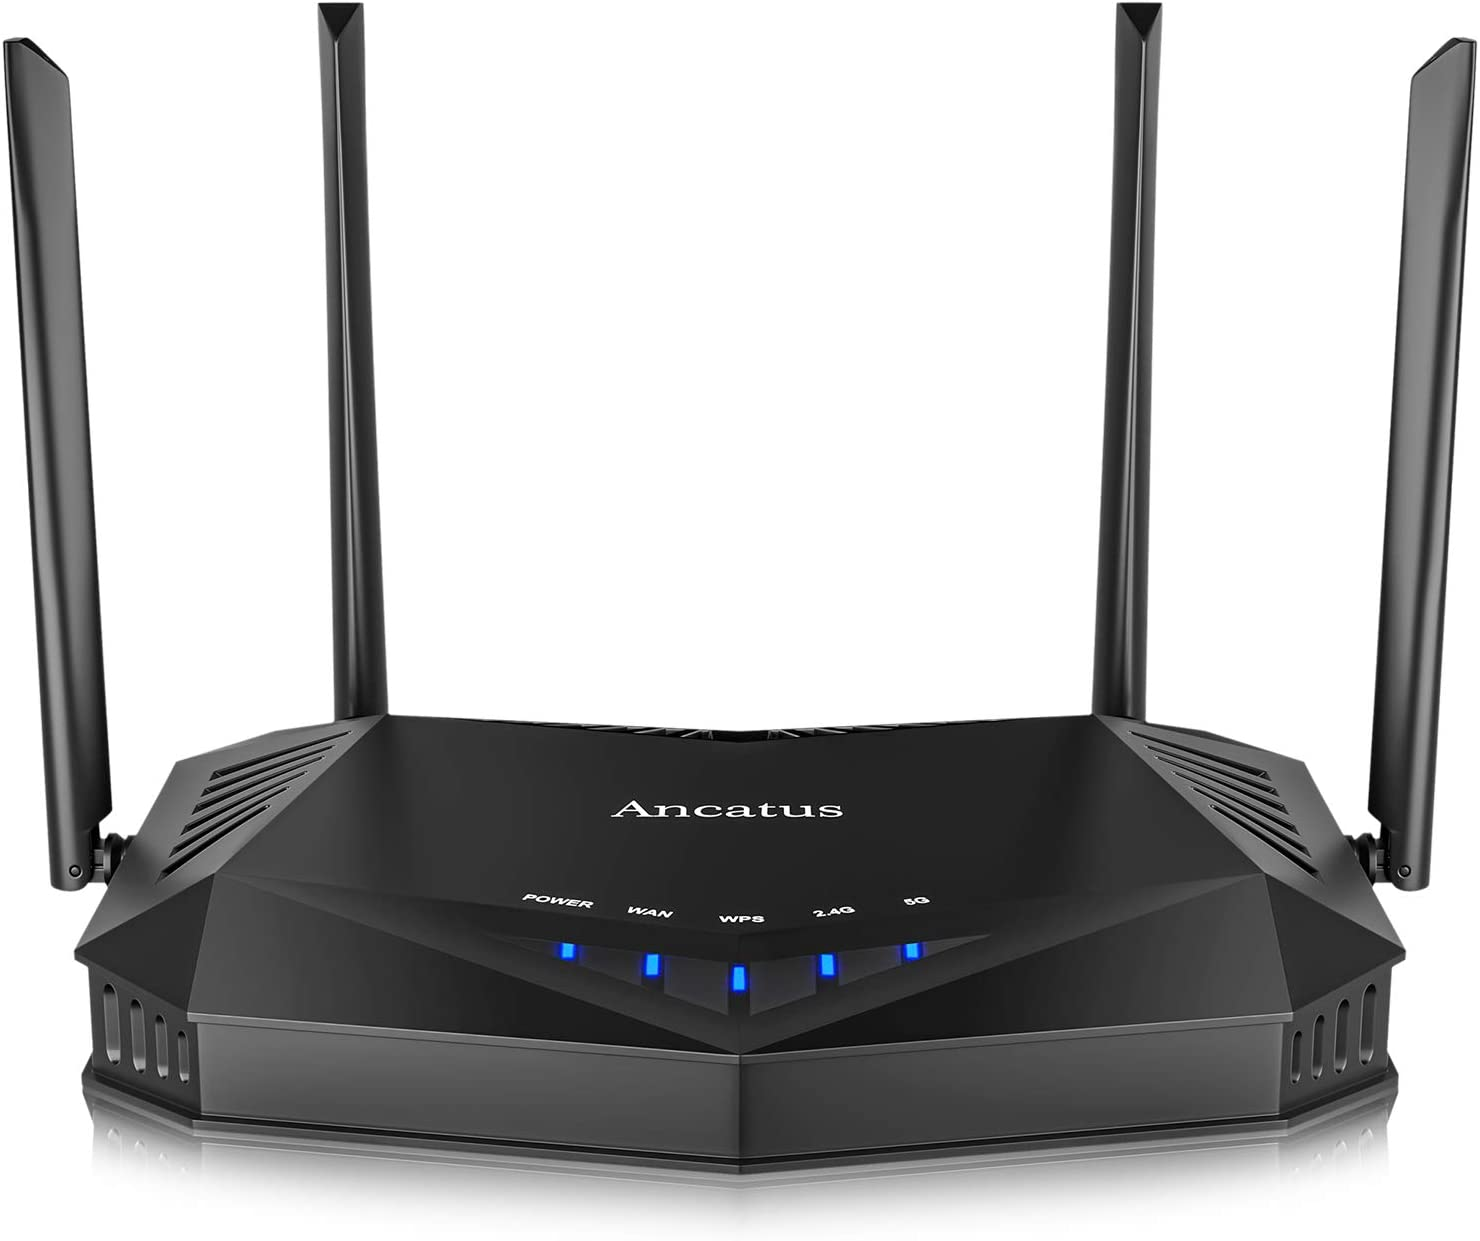 Ancatus-WiFi 6 Router AX1800 Houston Mall Max 80% OFF 1.8G WiFi Gigabi Dual Band